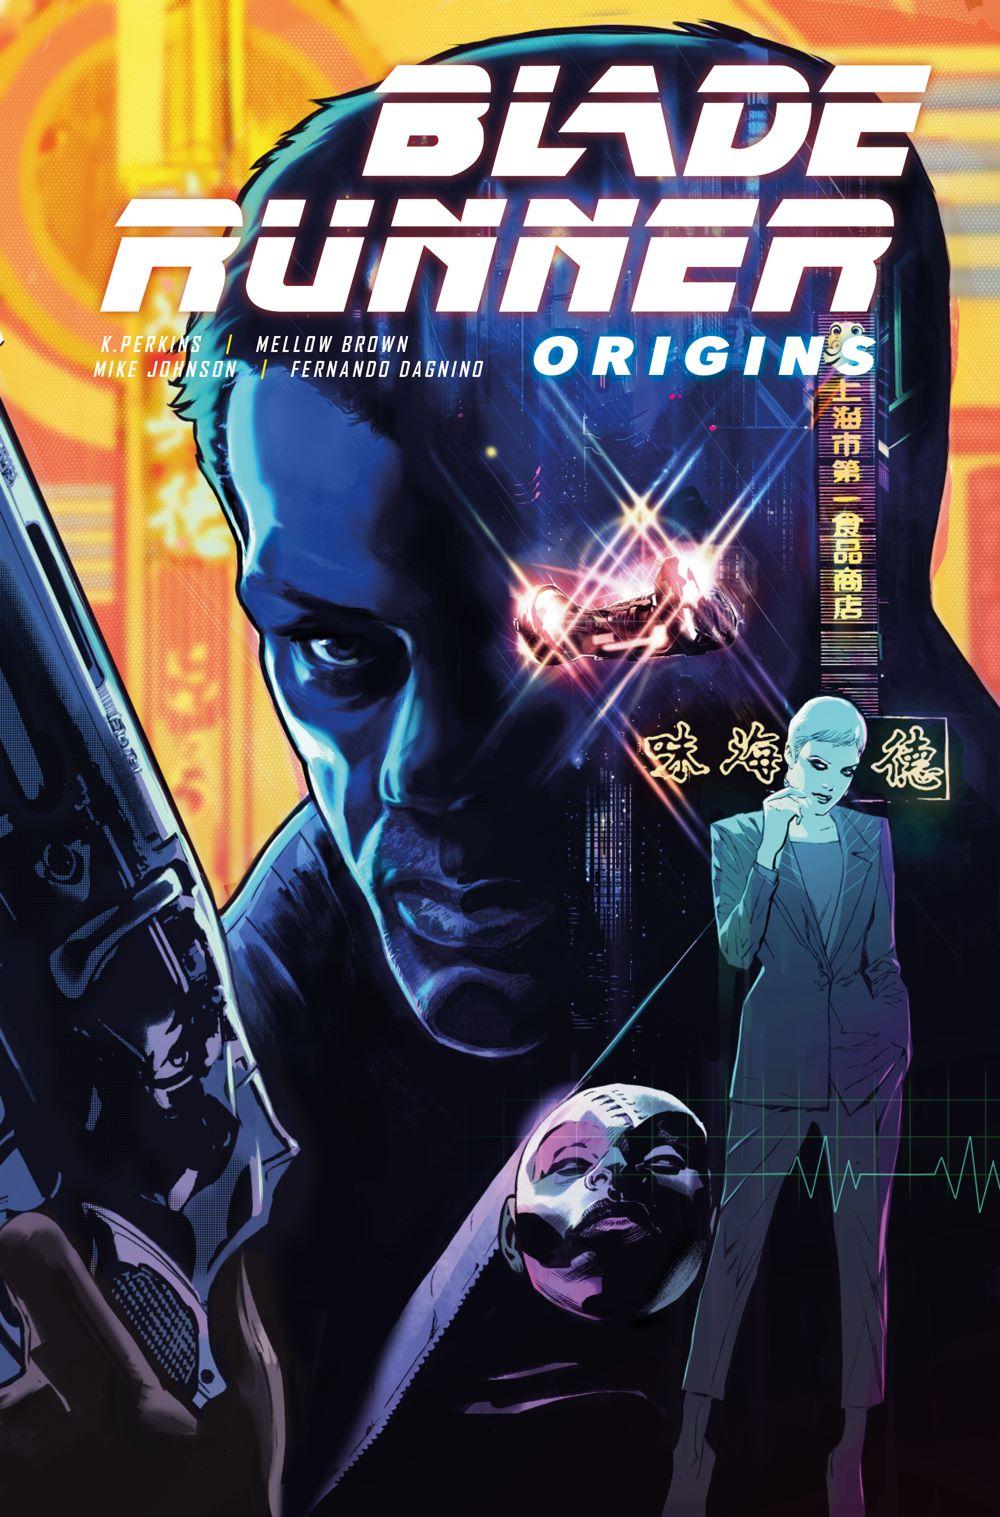 Blade-Runner-Origins_1_C_FERNANDO-DAGNINO ComicList: Titan Comics New Releases for 03/10/2021